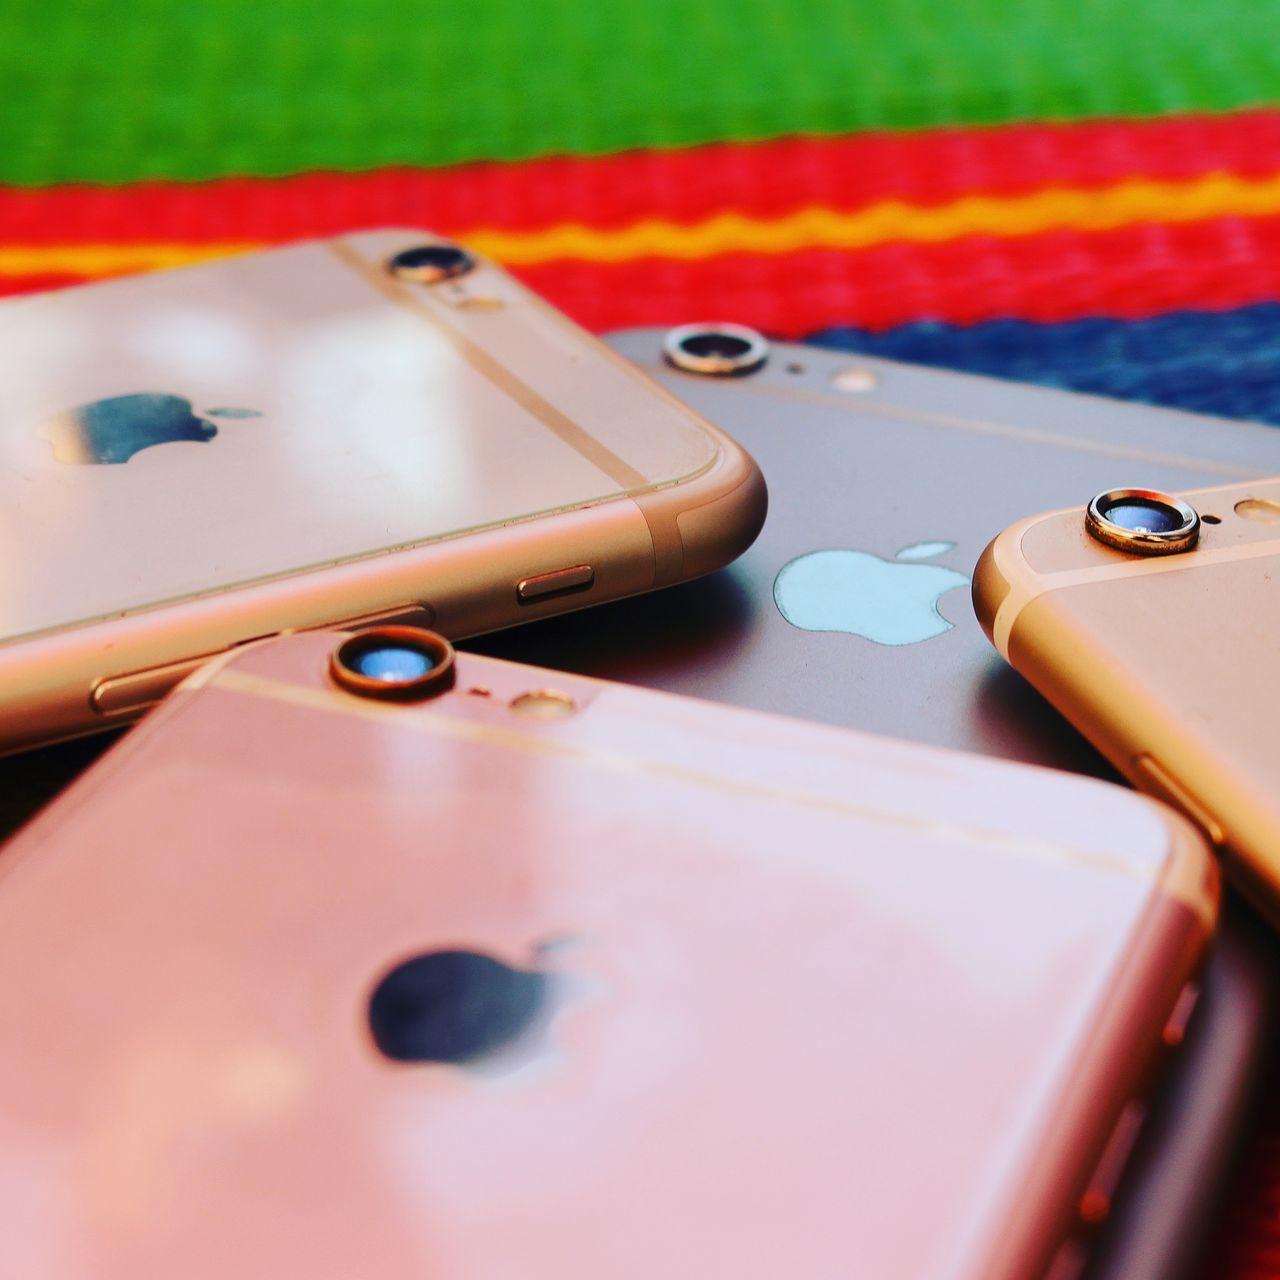 I Phone I Phone6 I Phone 6s Mobile Phone Apple Apple Phone Apple Brand